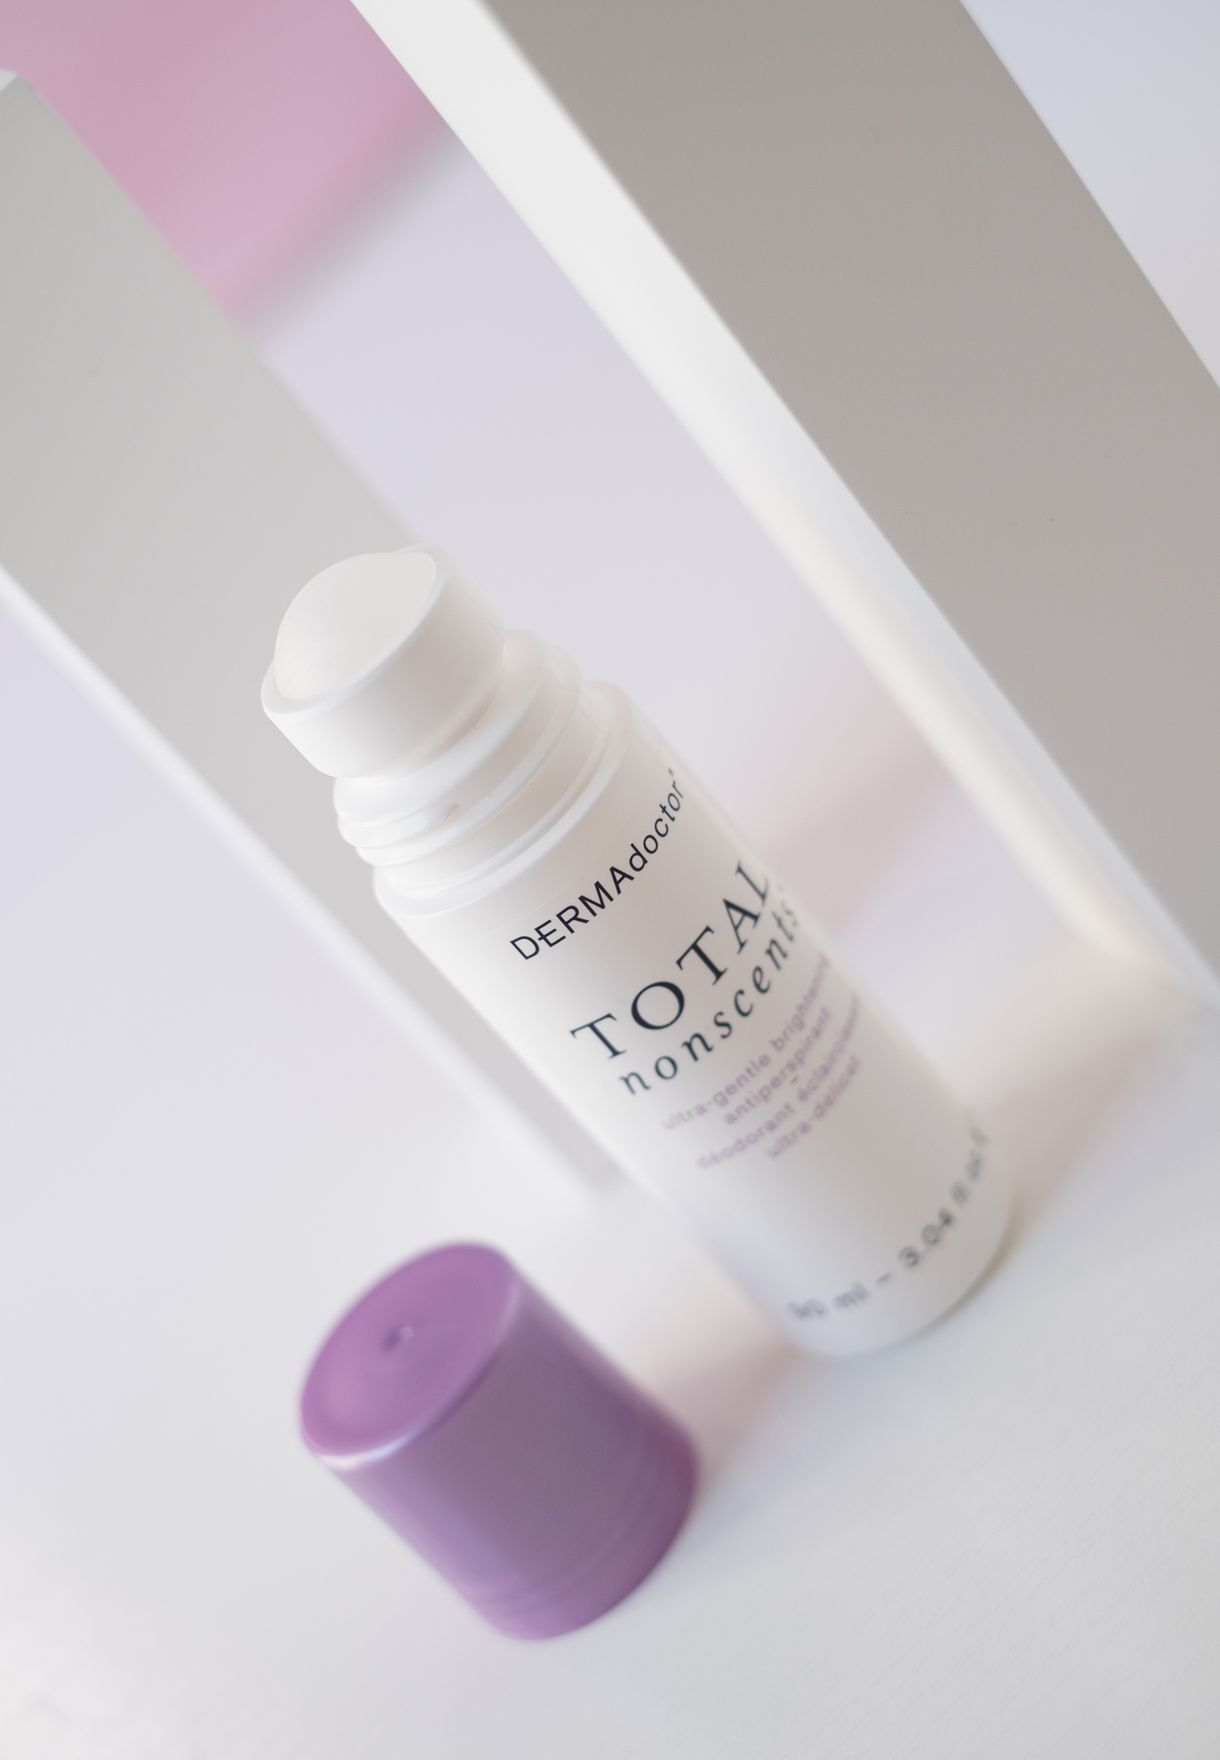 Total Nonscents Brightening Antiperspirant